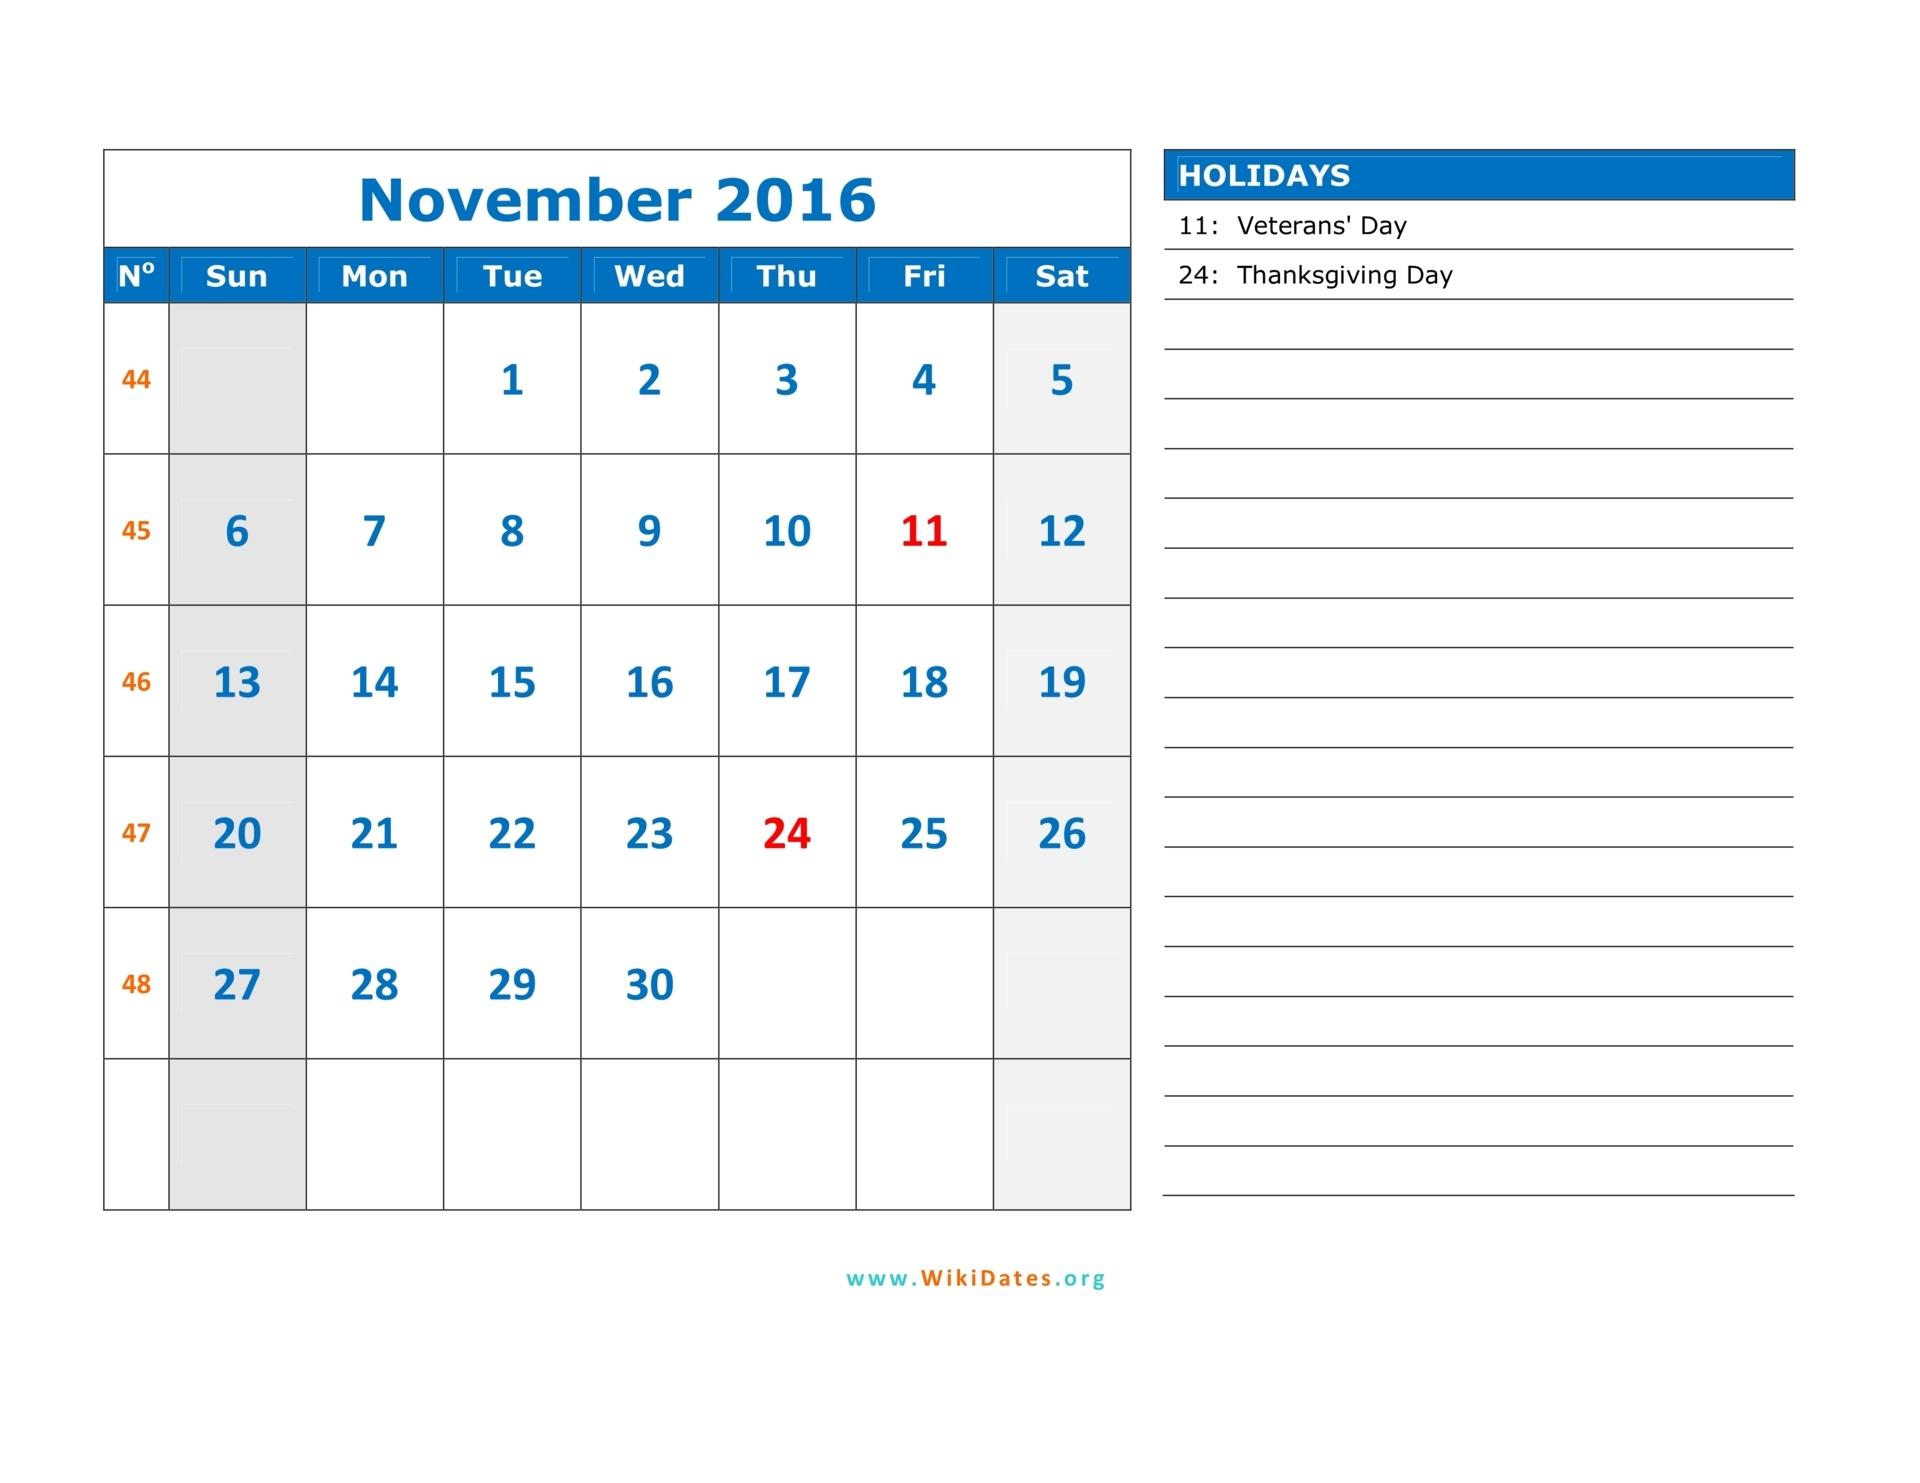 2016 Calendar Templates Monday To Sunday | Calendar Template 2016